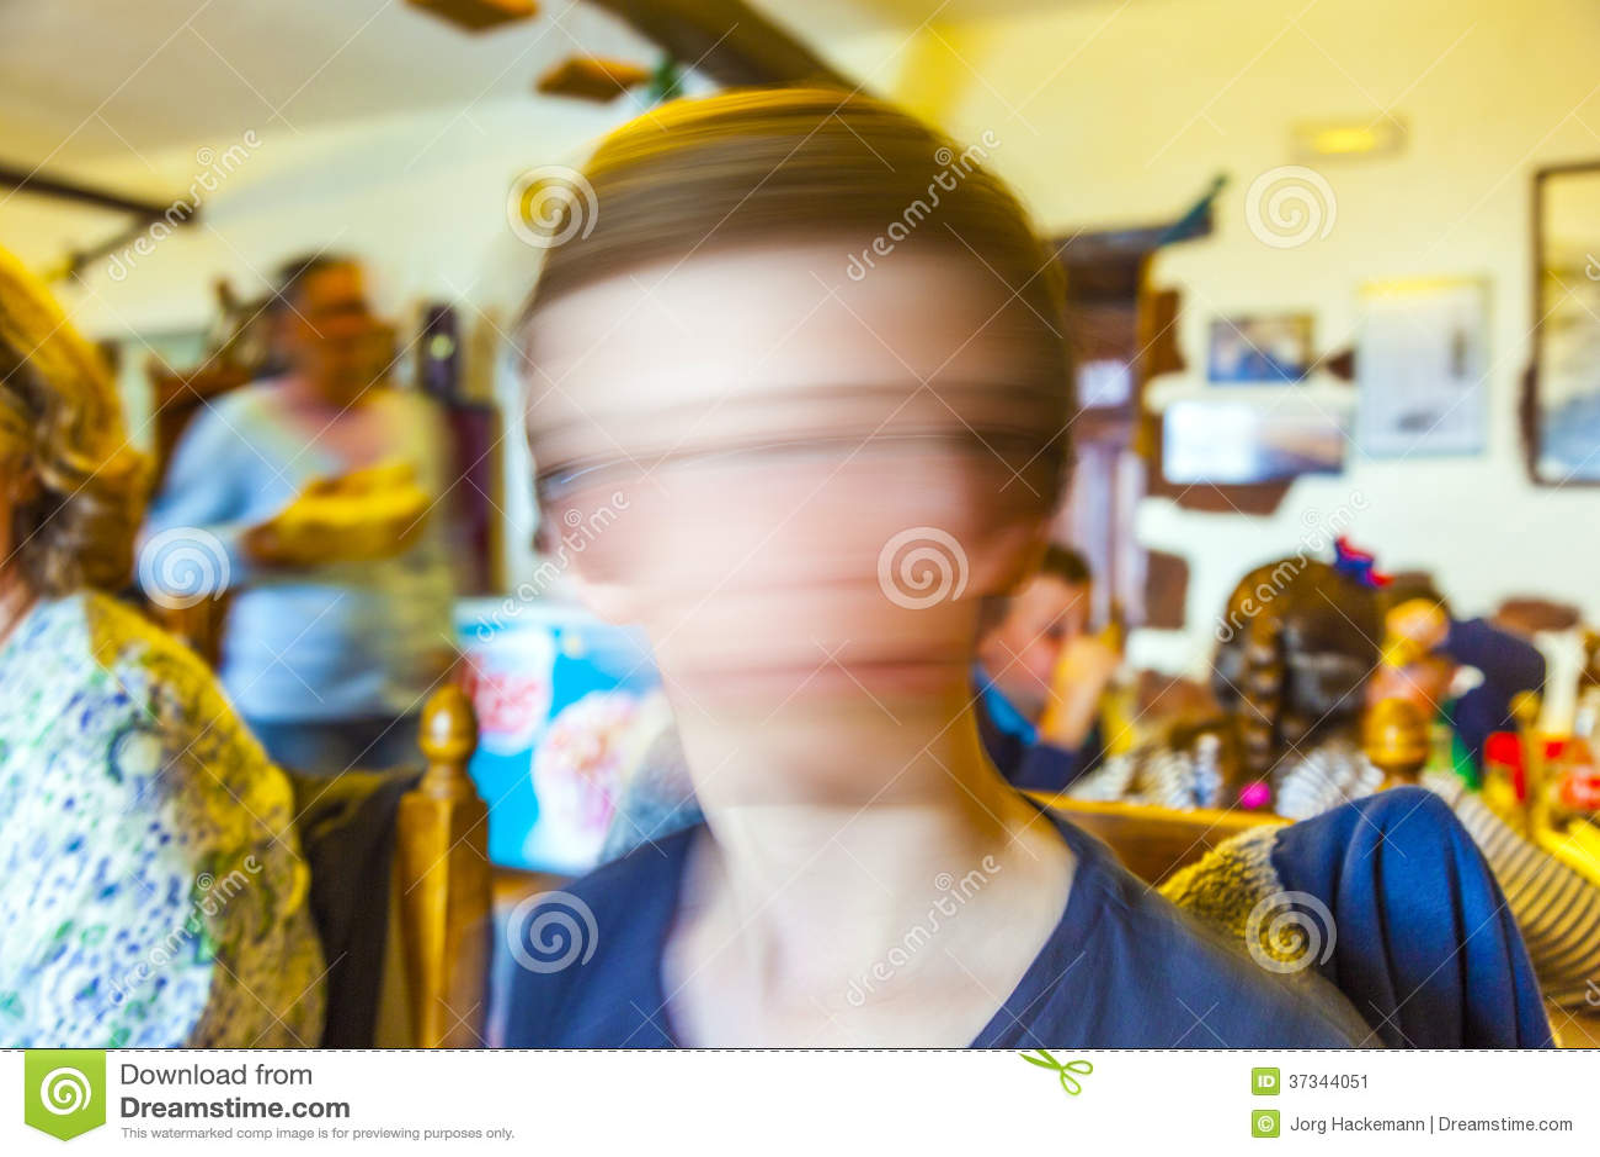 Gullig ung pojke i en restaurang som skakar huvudet